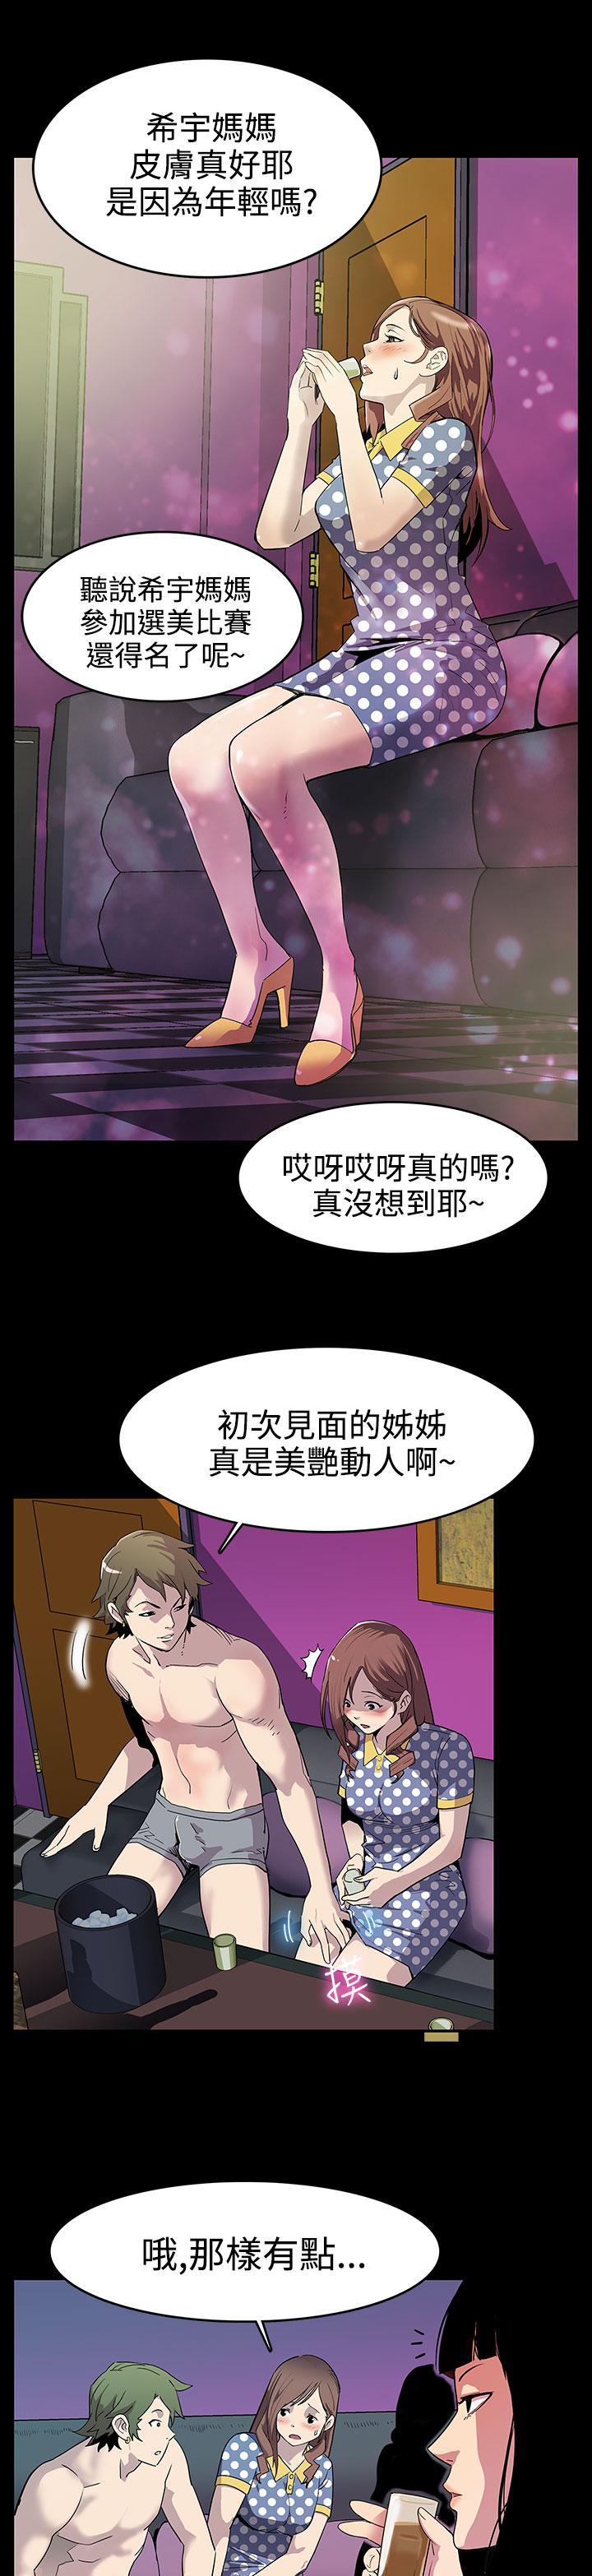 Mom cafe 第1話 [Chinese]中文 4